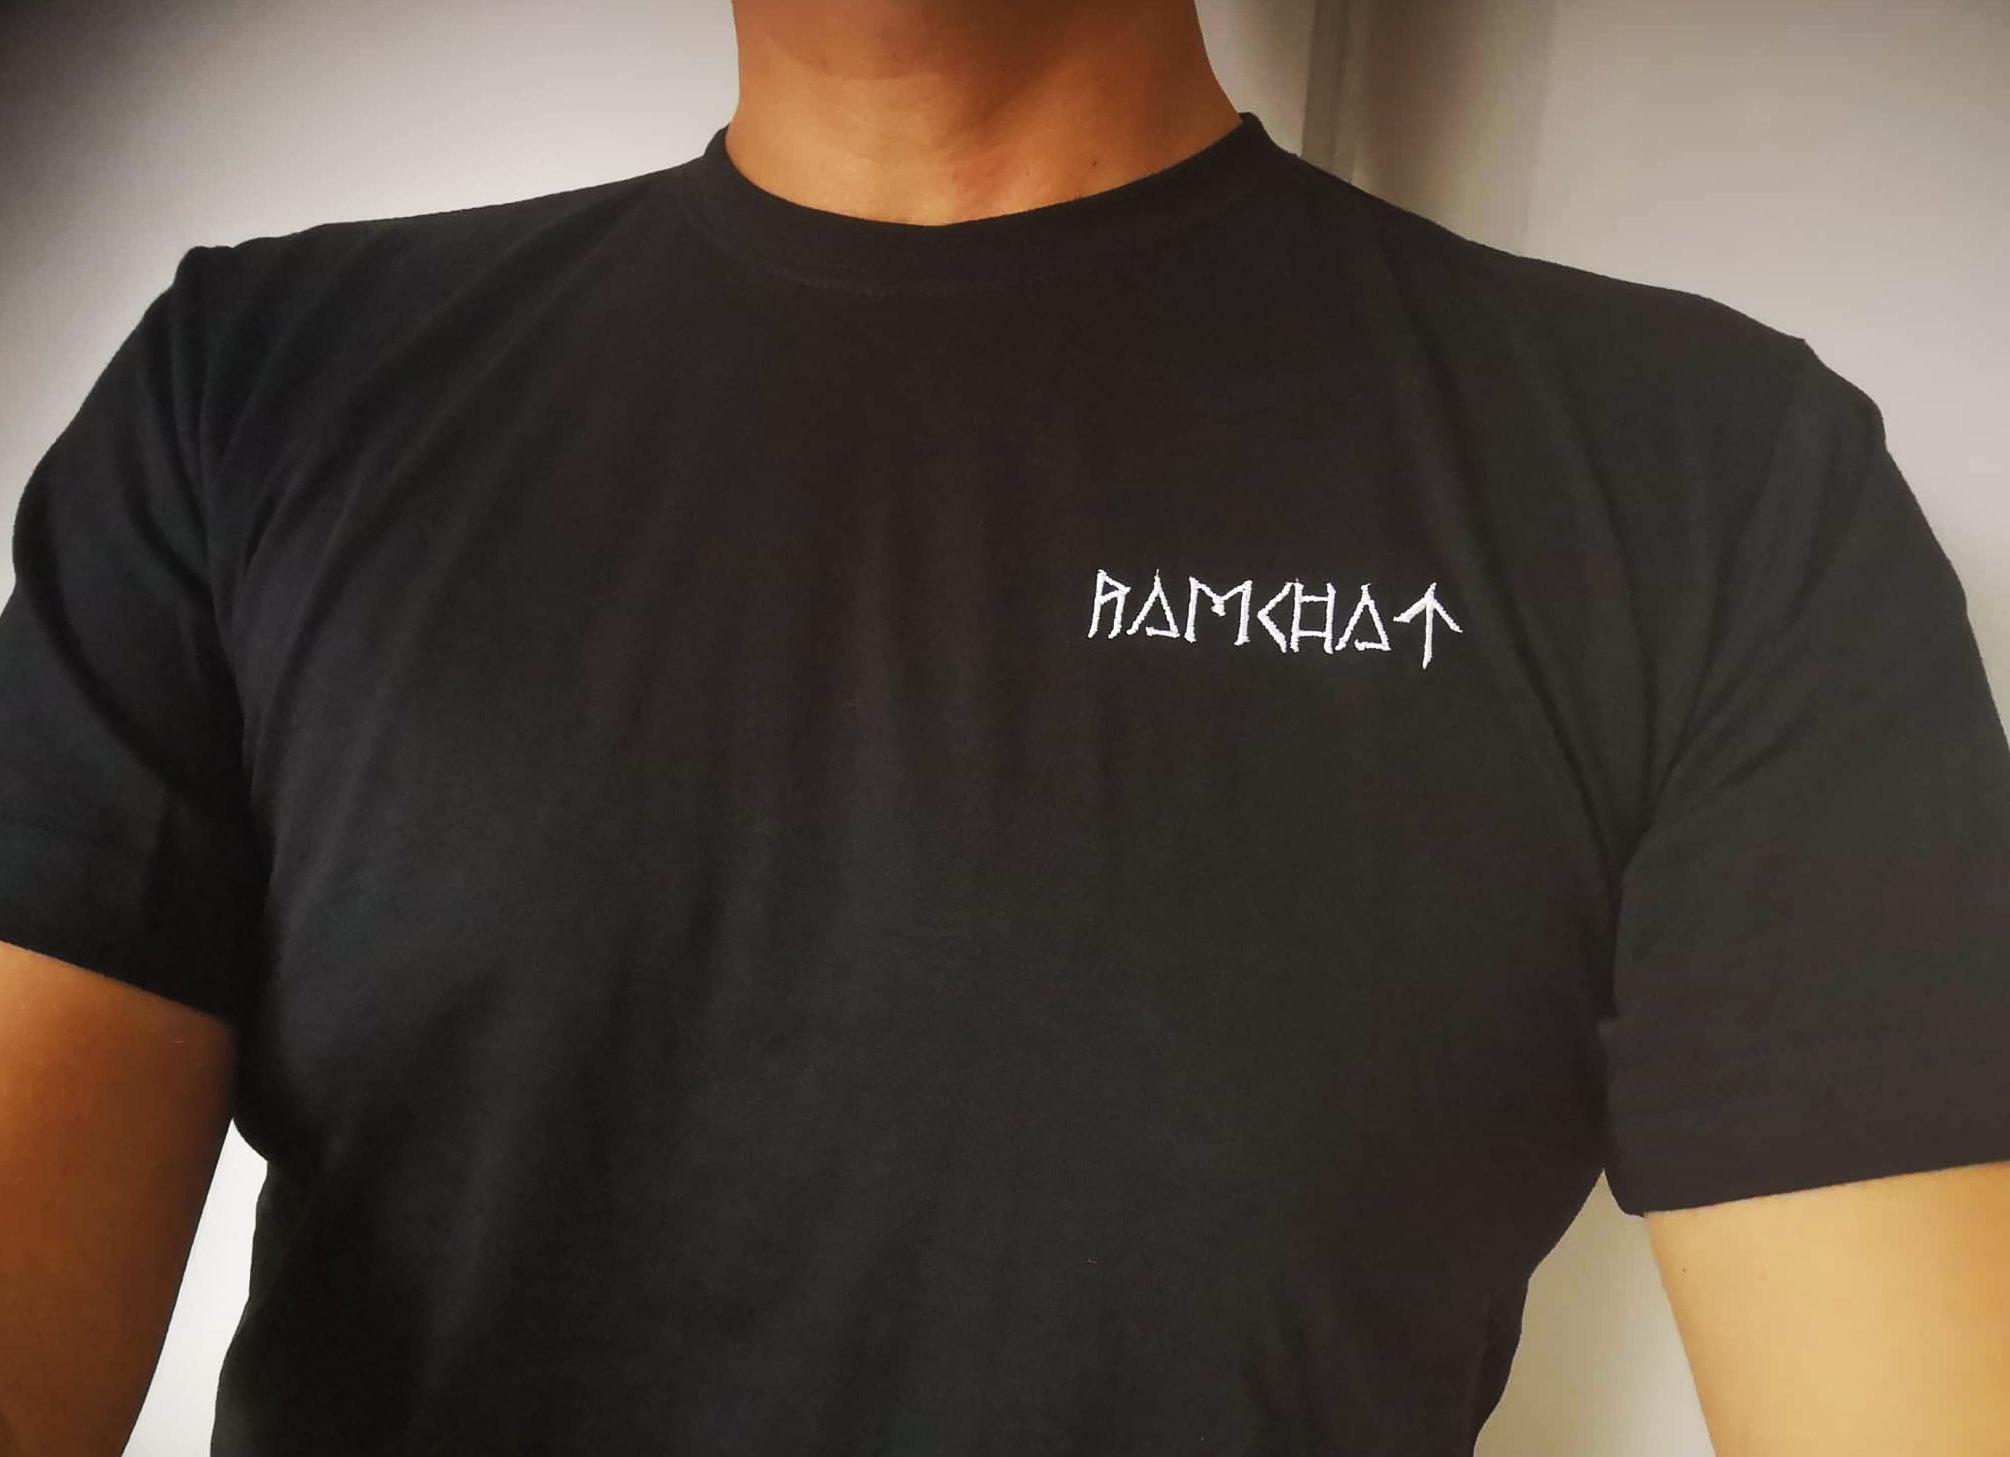 RAMCHAT 03 - Ramchat